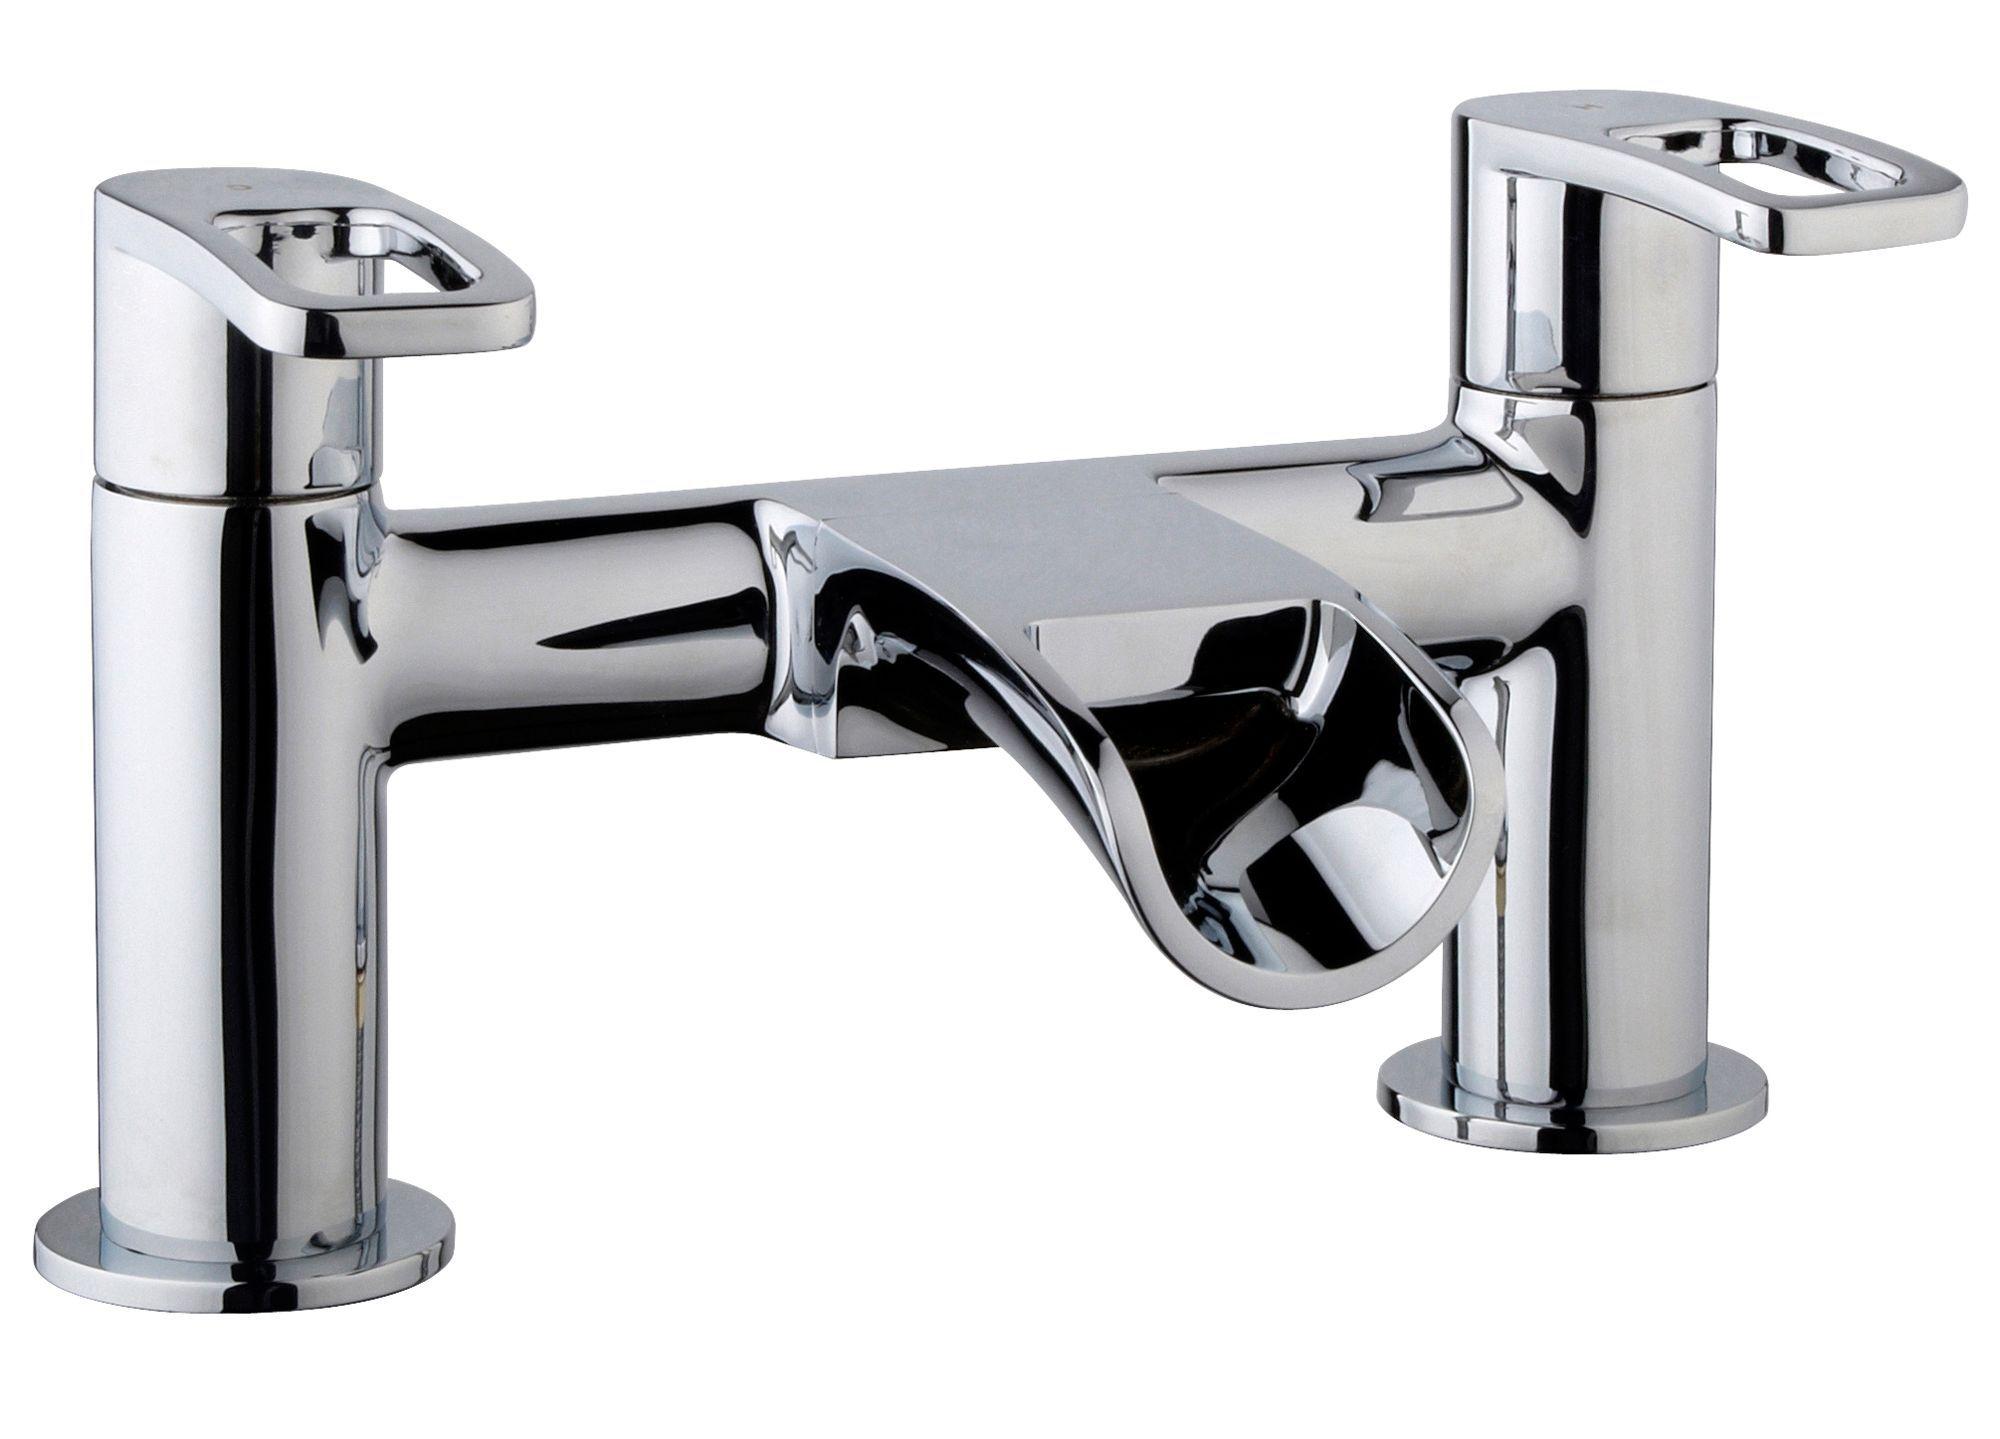 Cooke & Lewis Saverne Chrome Bath Mixer Tap | Departments ...